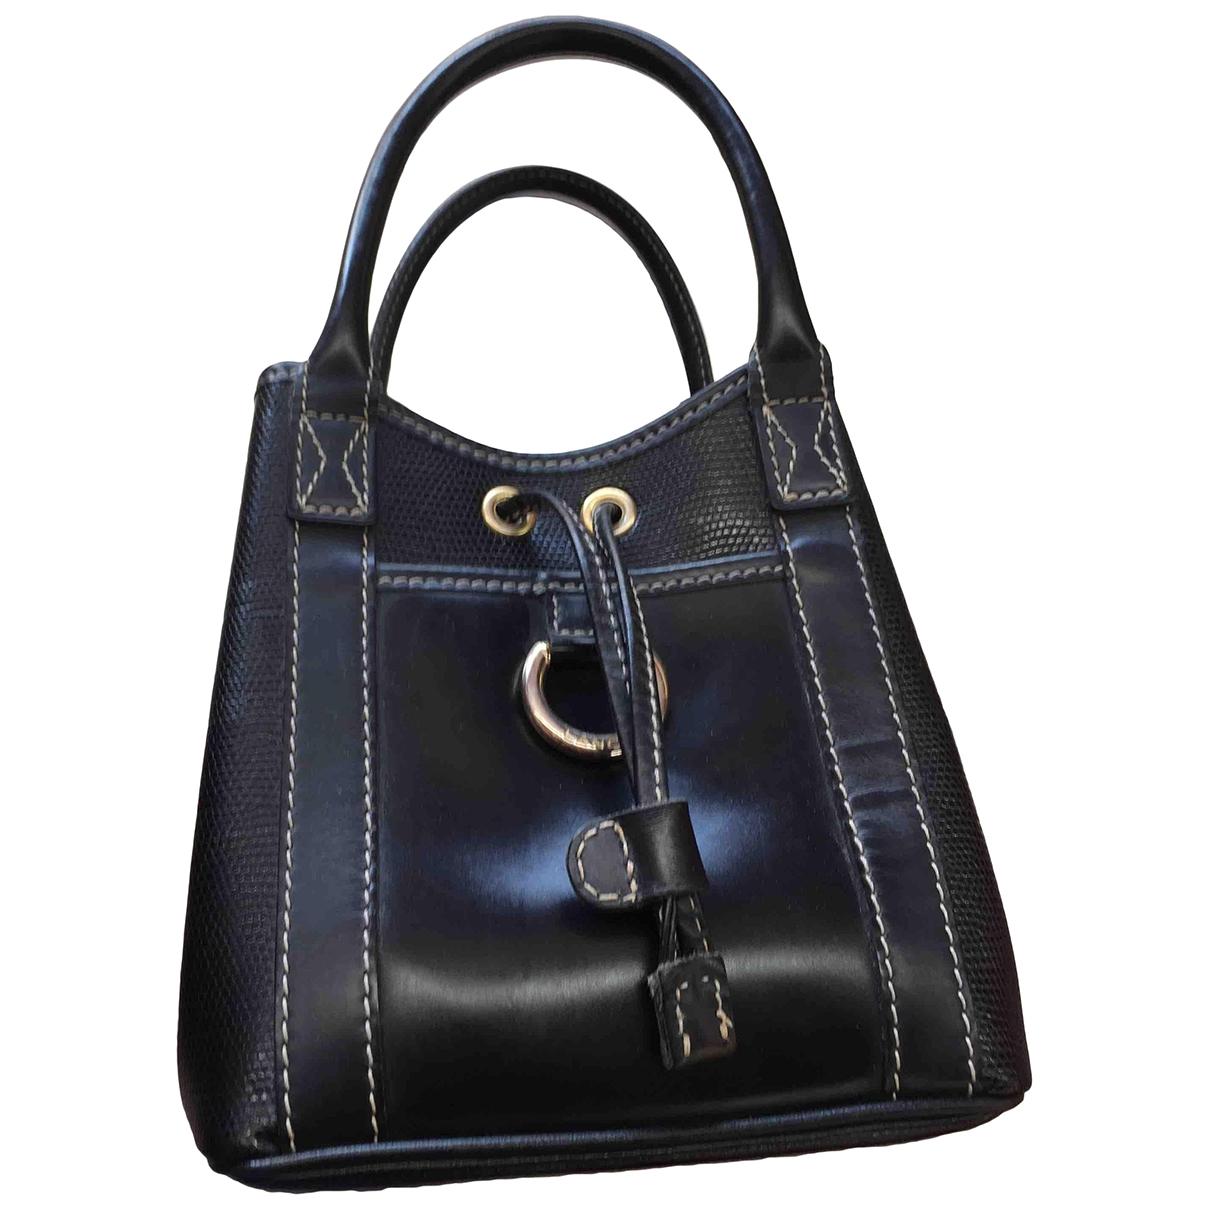 Lancel \N Black Patent leather handbag for Women \N